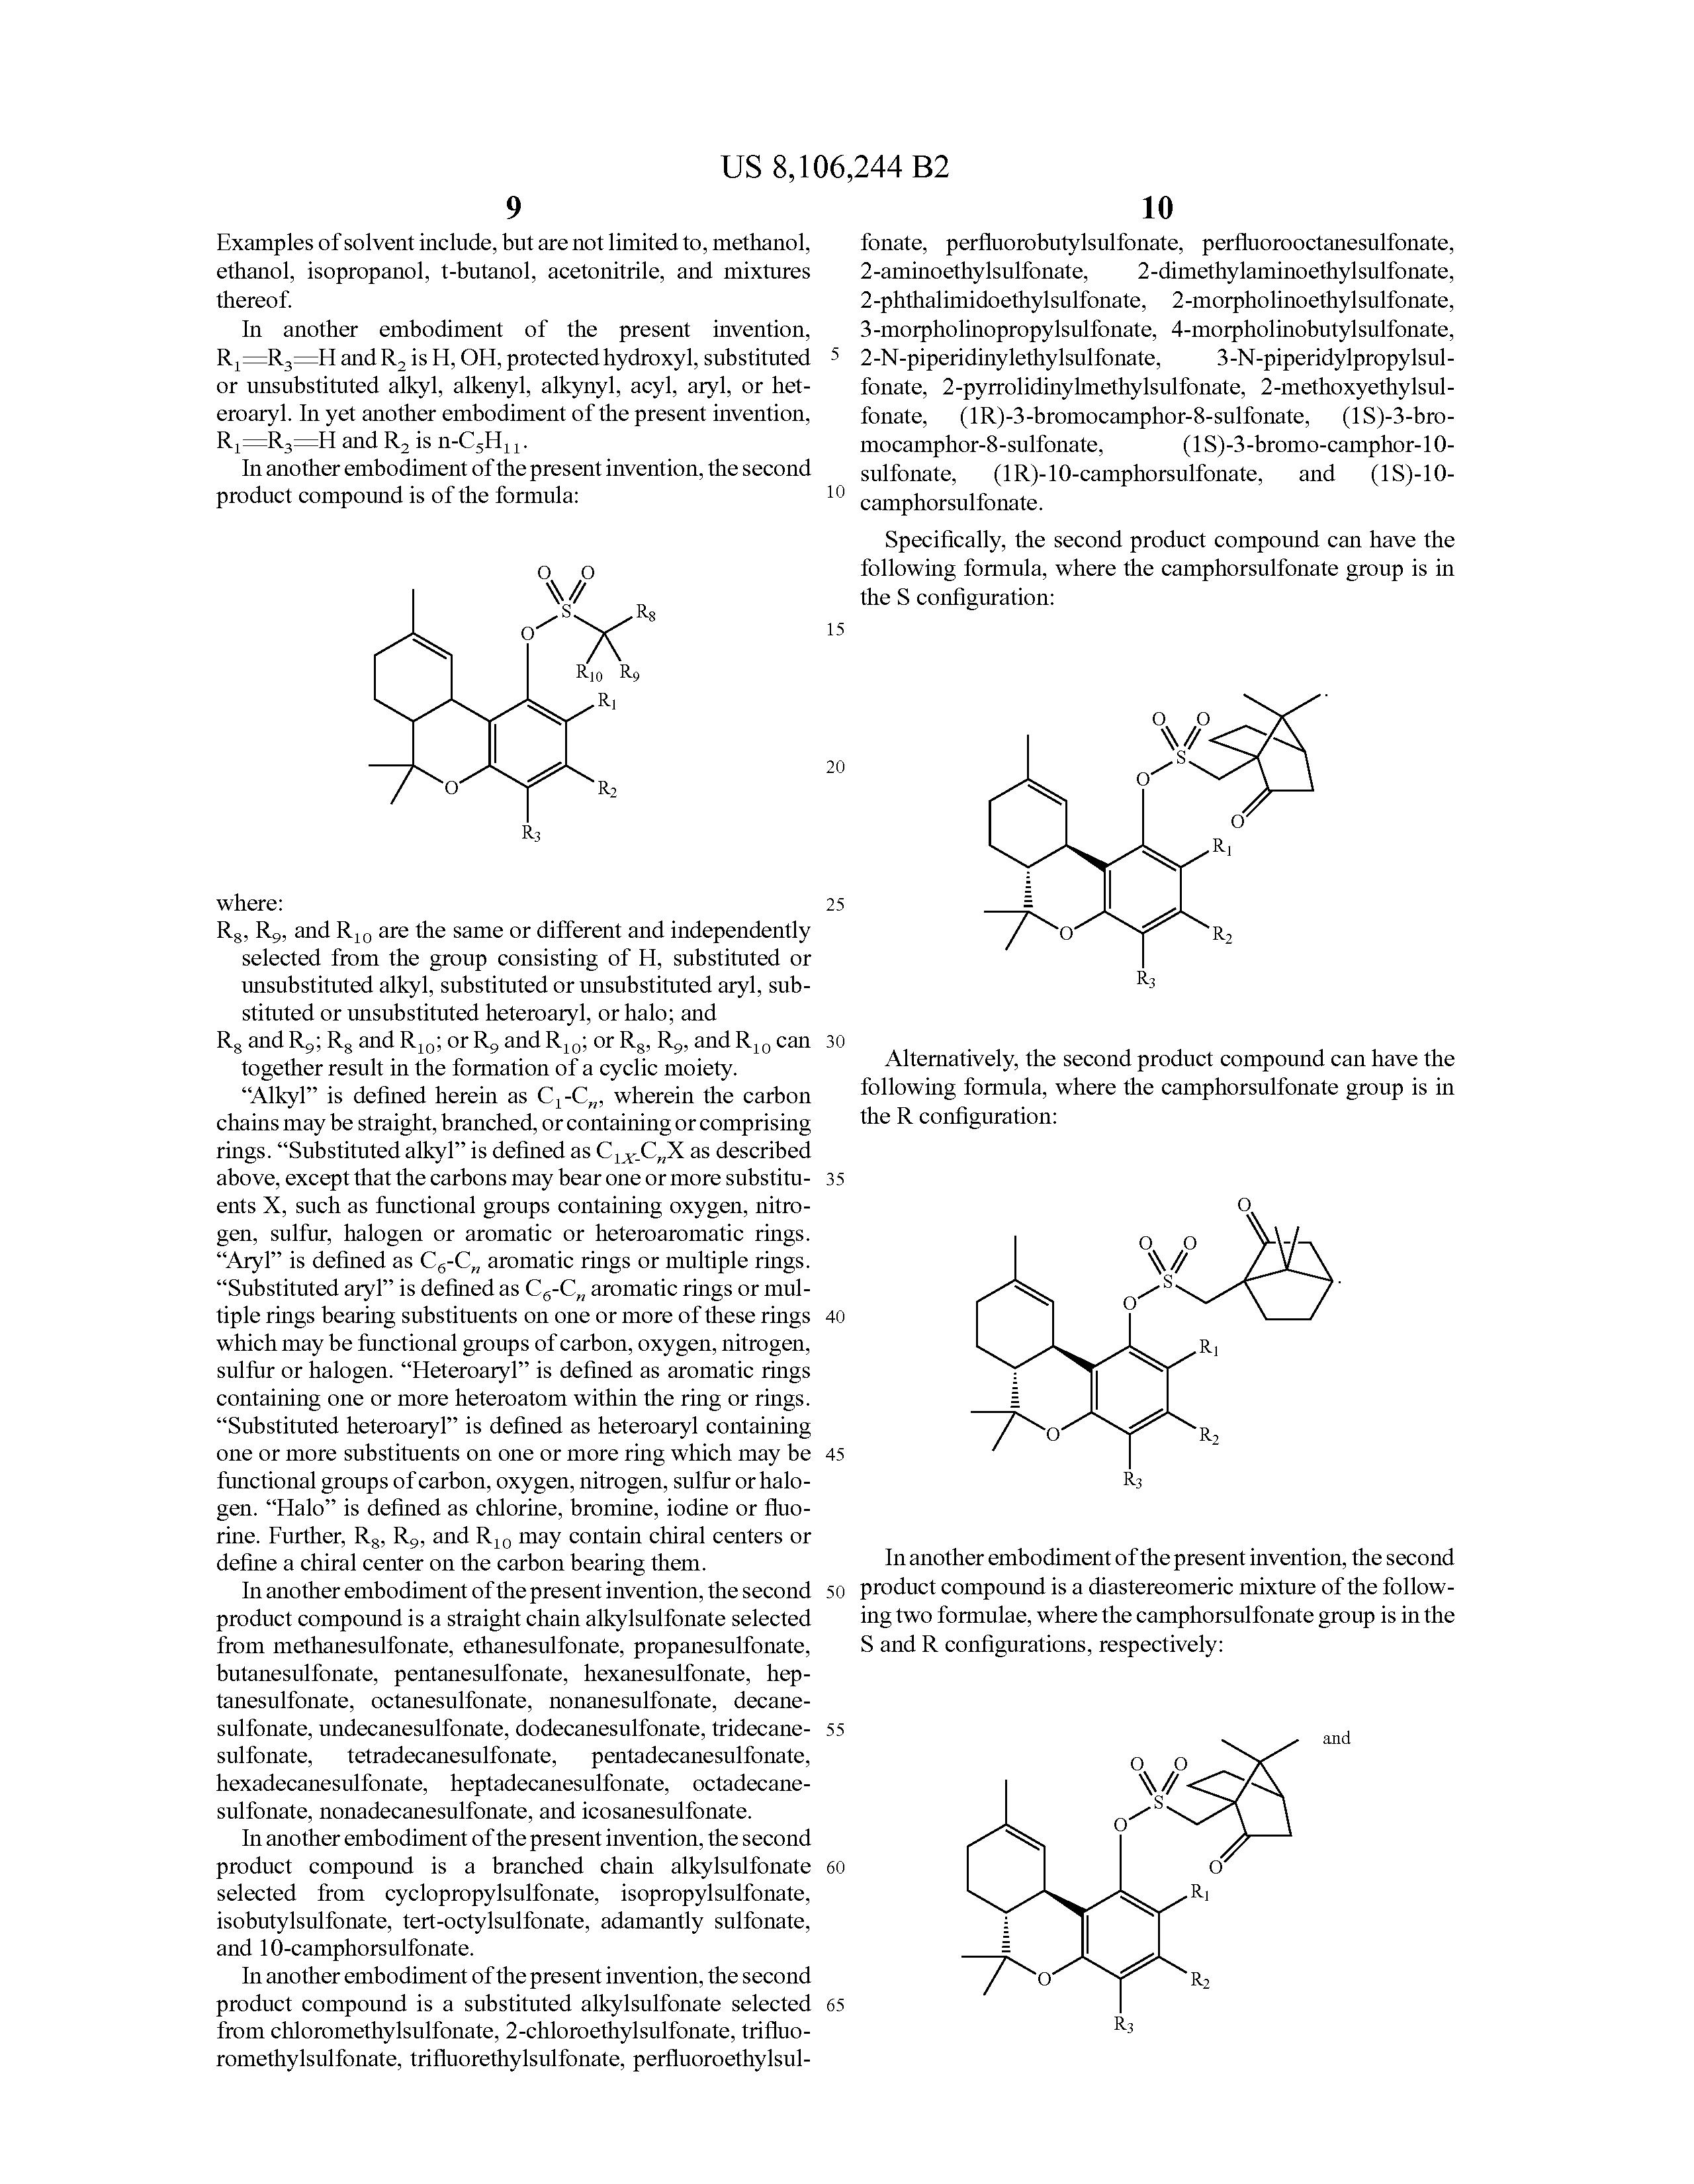 analysis of tetrahydrocannabinol Δ9-tetrahydrocannabinol binds to neuronal cb1 receptors, 33 which are found on gabaergic and glutamatergic neurons  using an analysis of variance within-subjects .